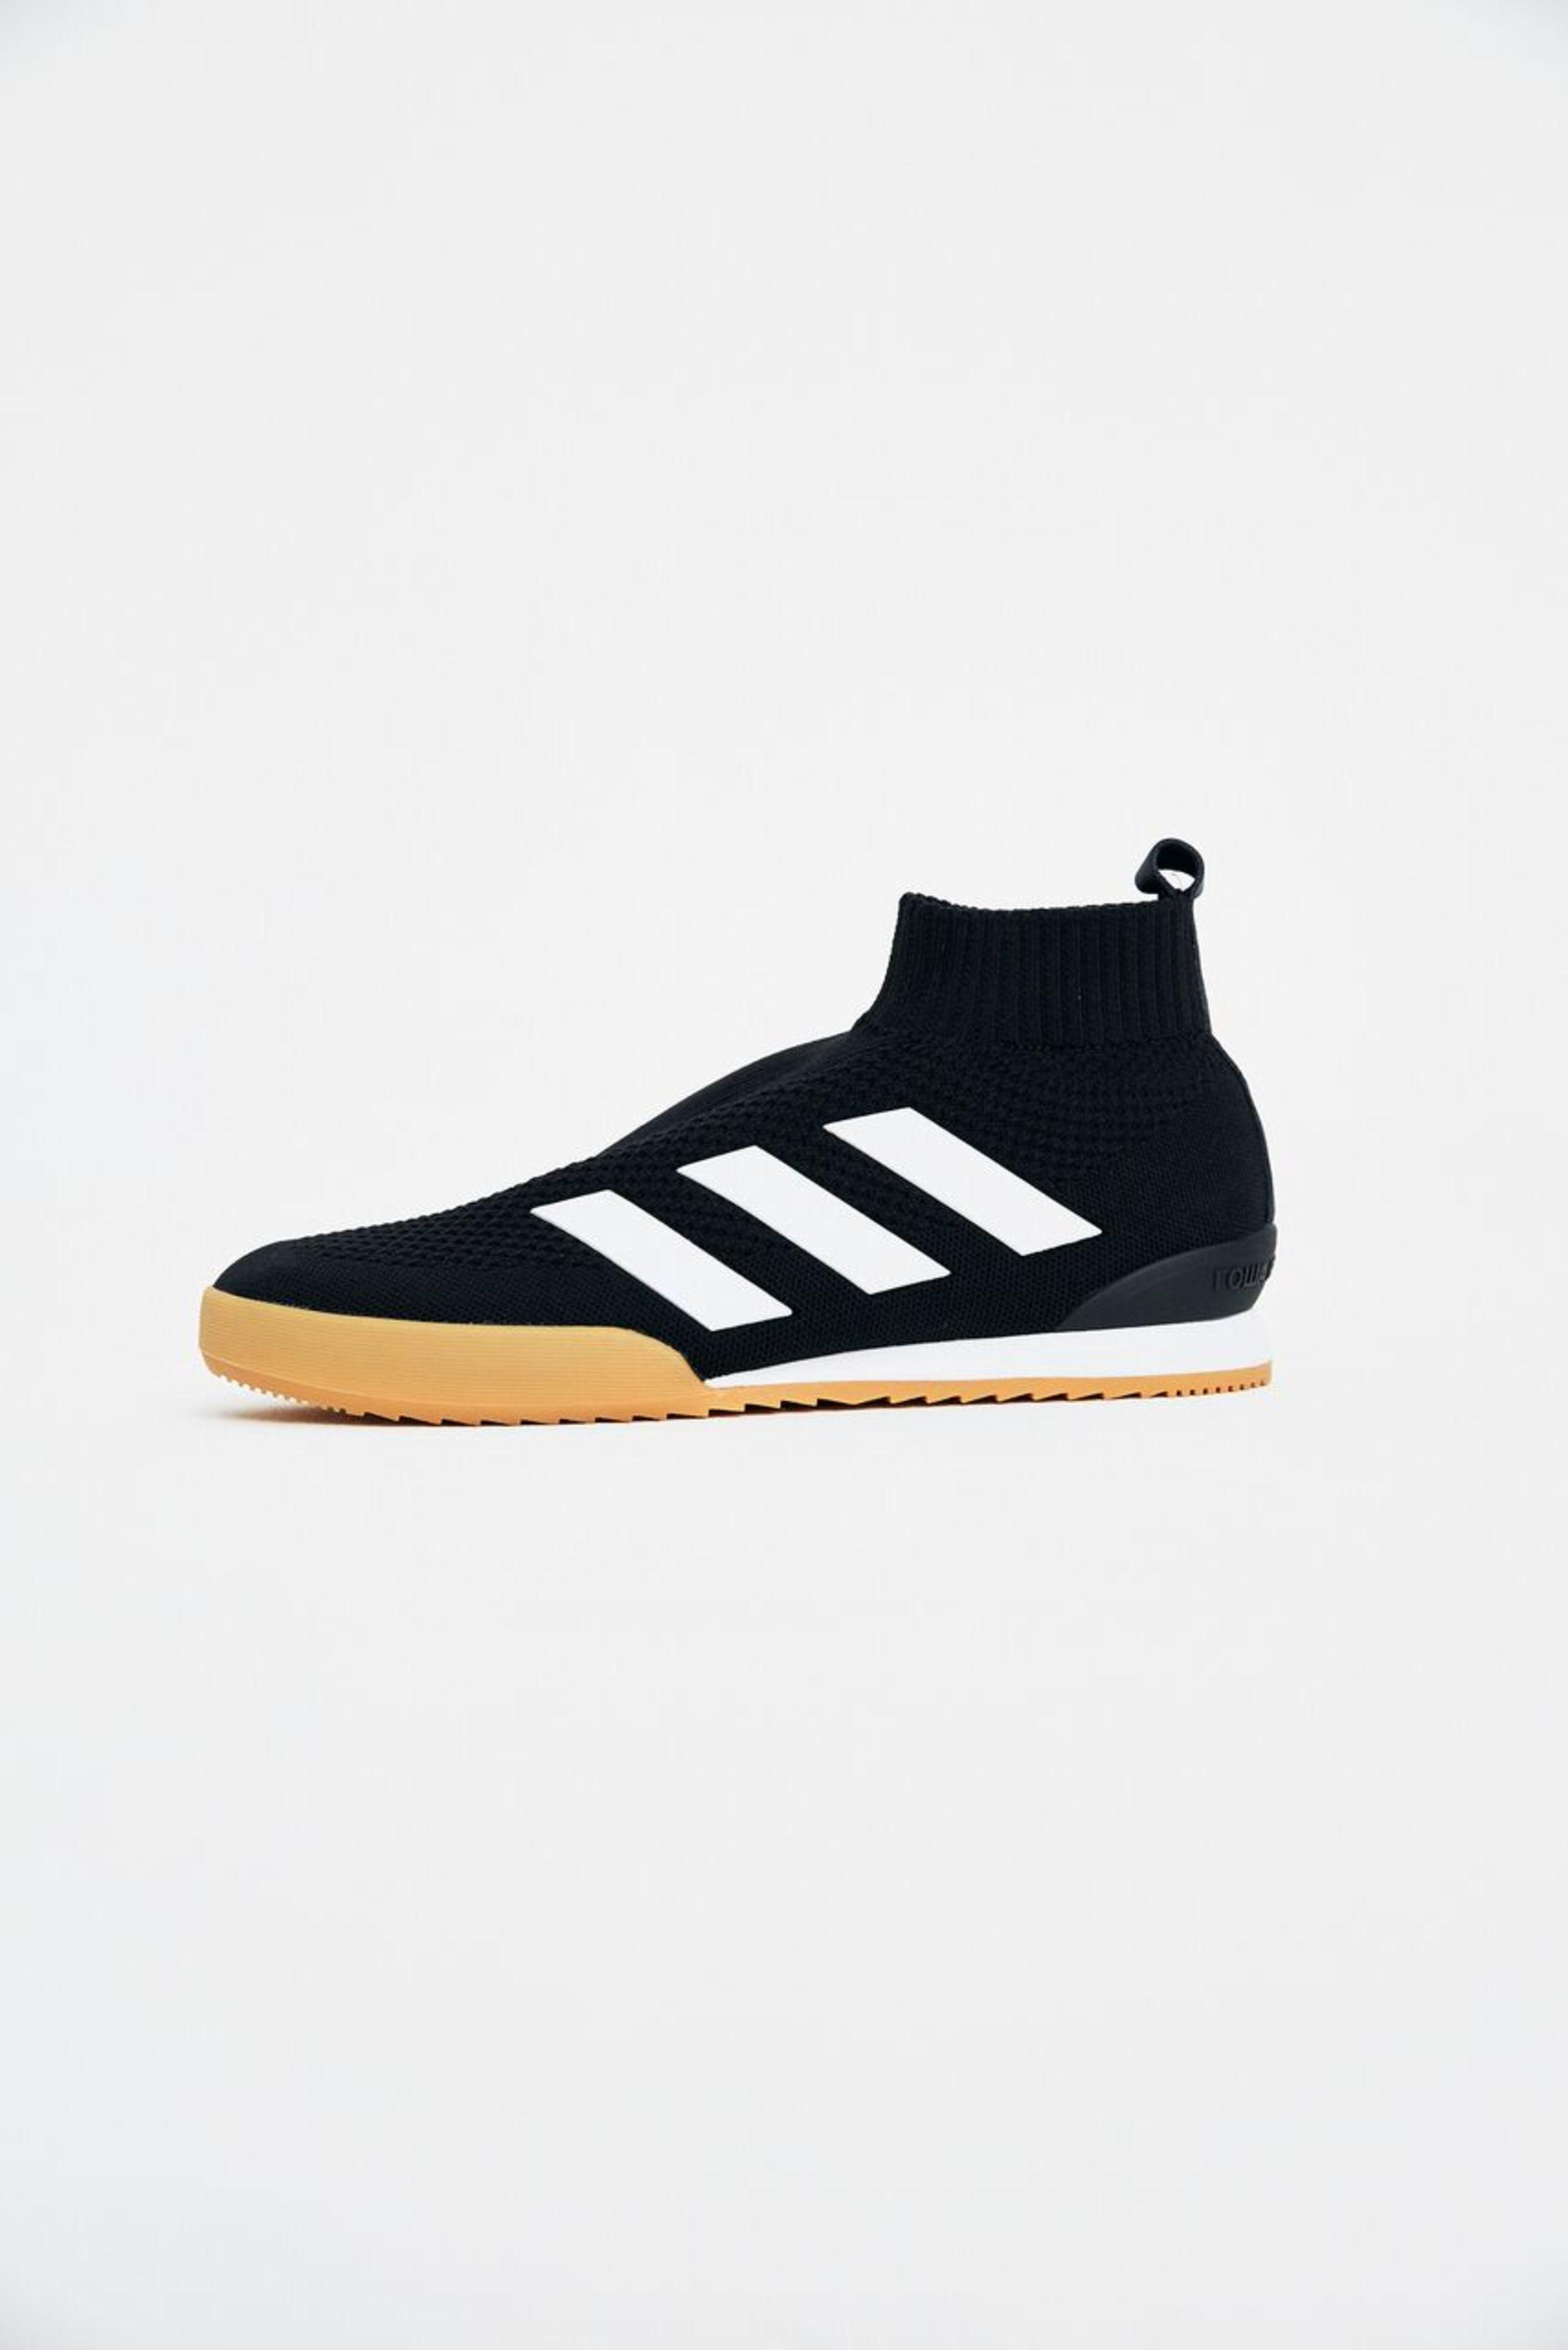 promo code b51e7 52b51 Lyst - Gosha Rubchinskiy Black Ace 16+ Super Shoes in Black